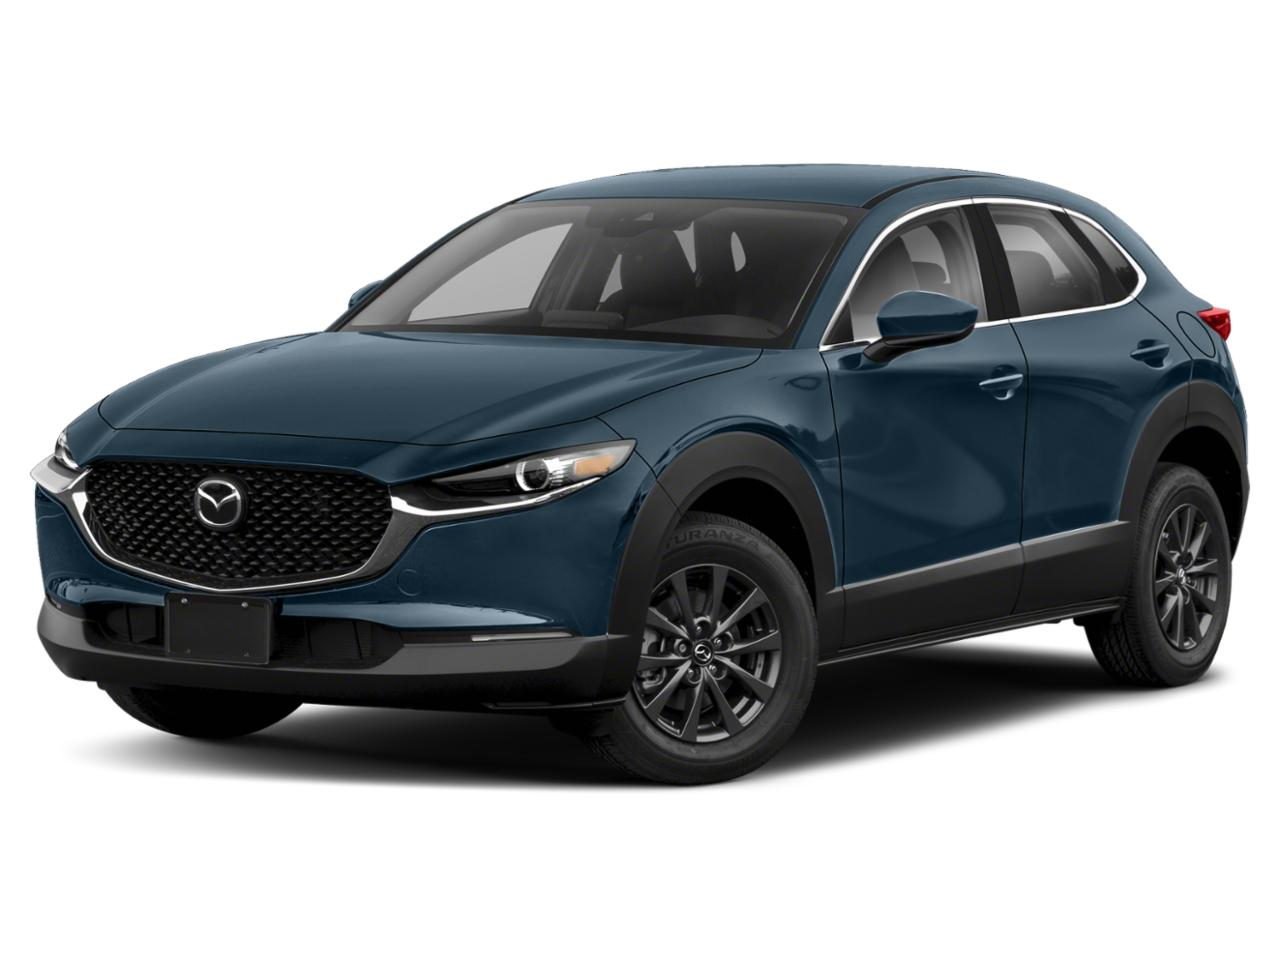 2021 Mazda CX-30 Vehicle Photo in Green Bay, WI 54304